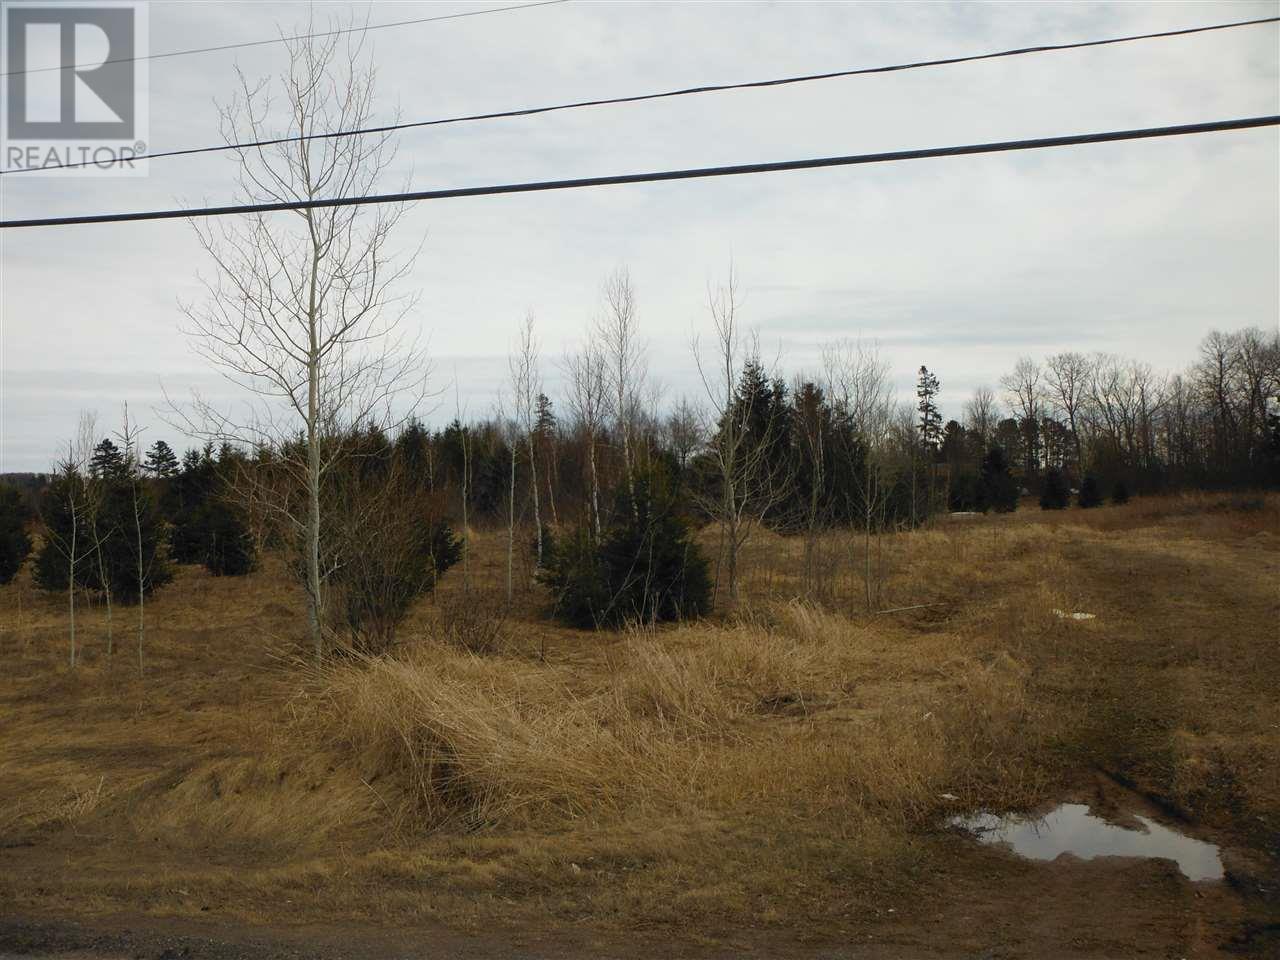 Lot 1-16 Royalty Junction Road, Charlottetown, Prince Edward Island  C1E 1Z2 - Photo 7 - 202006111